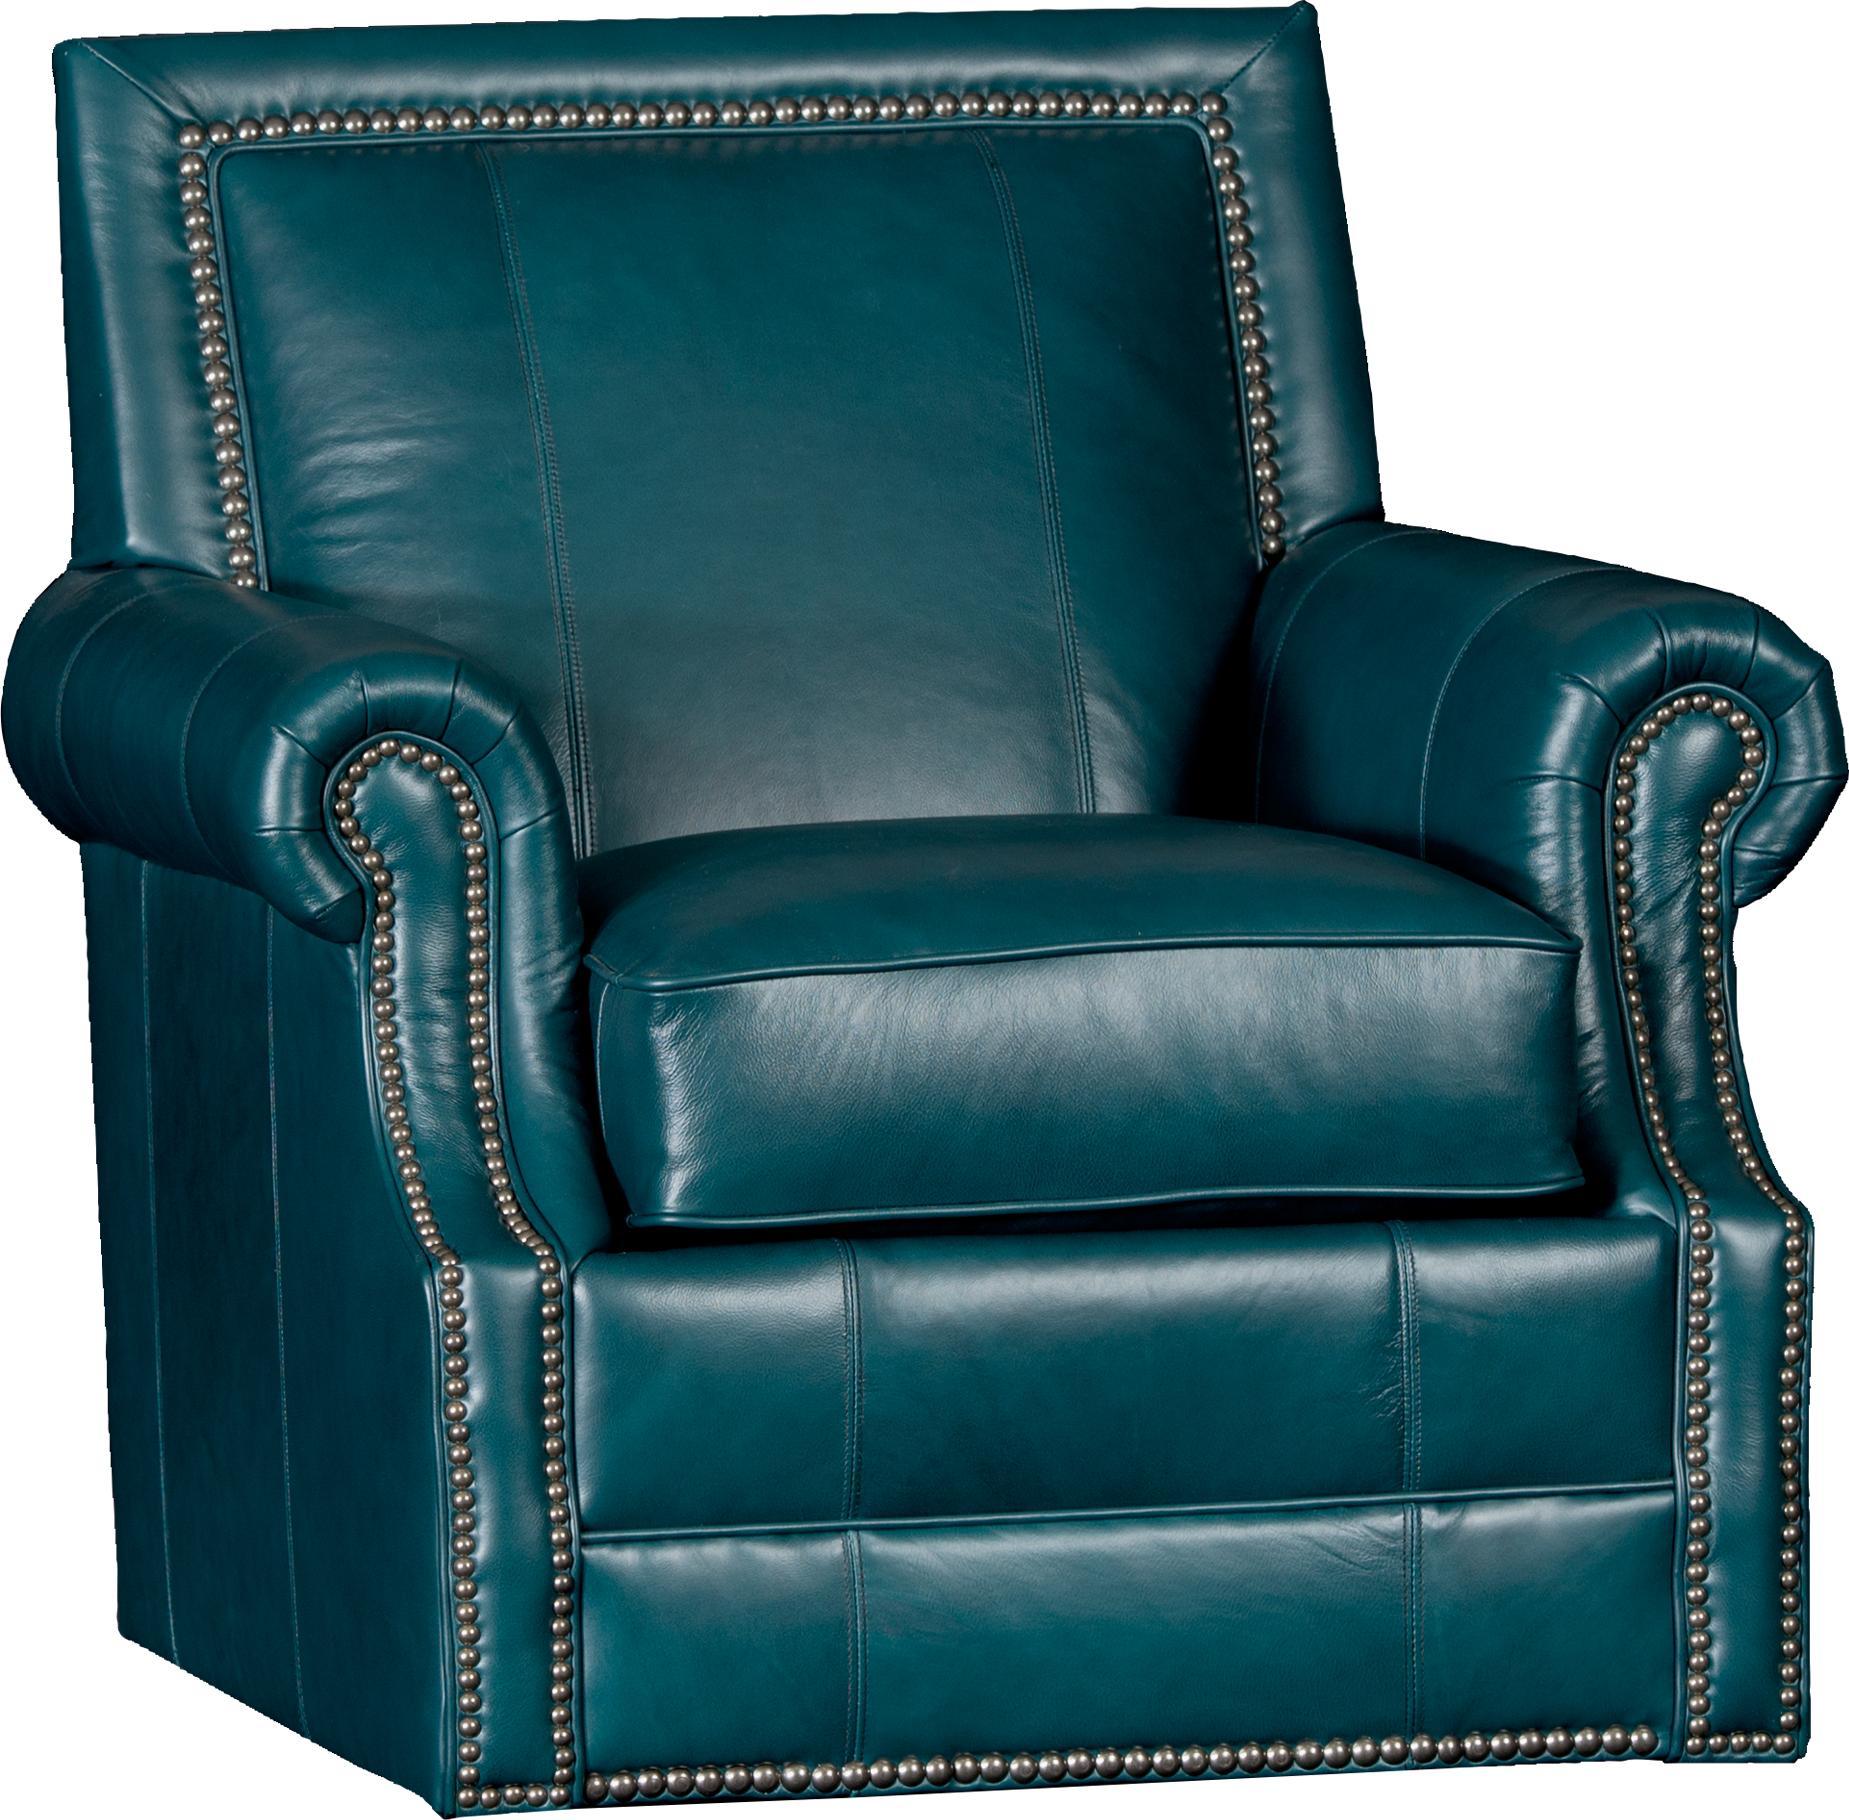 4110 Swivel Chair by Mayo at Pedigo Furniture